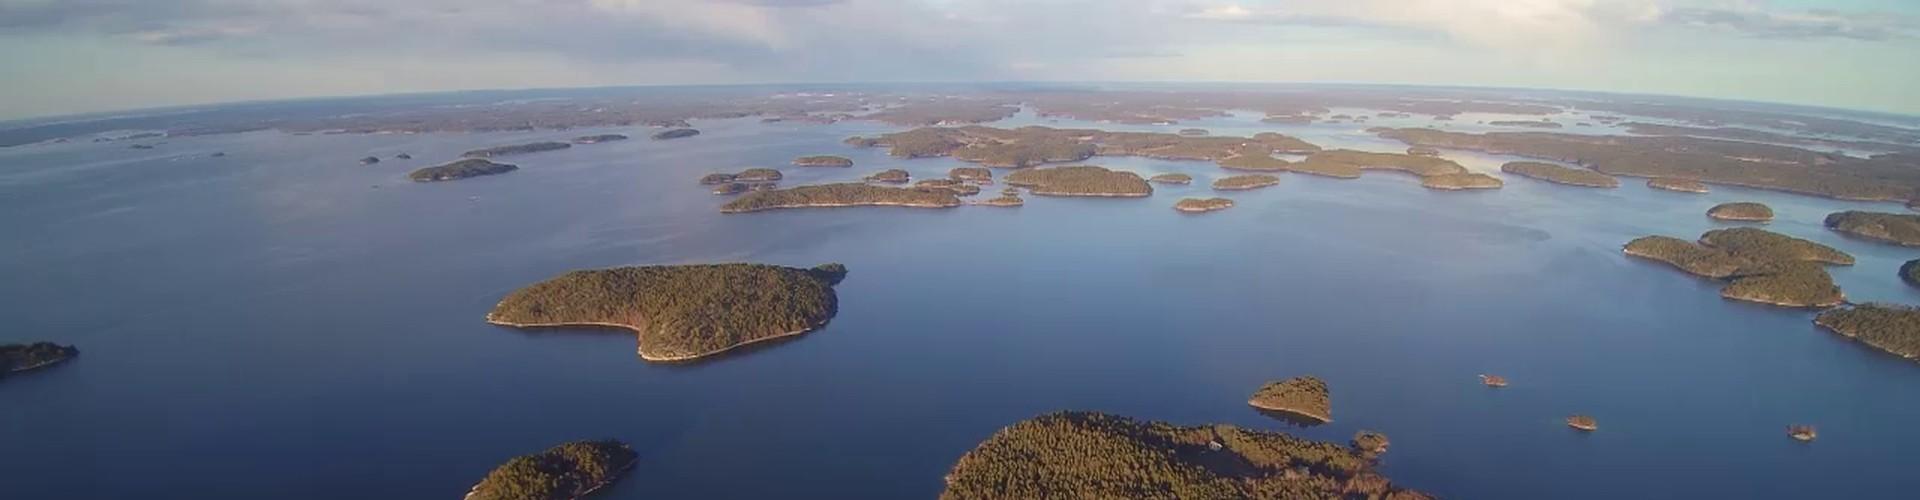 Archipelago Sea from a drone